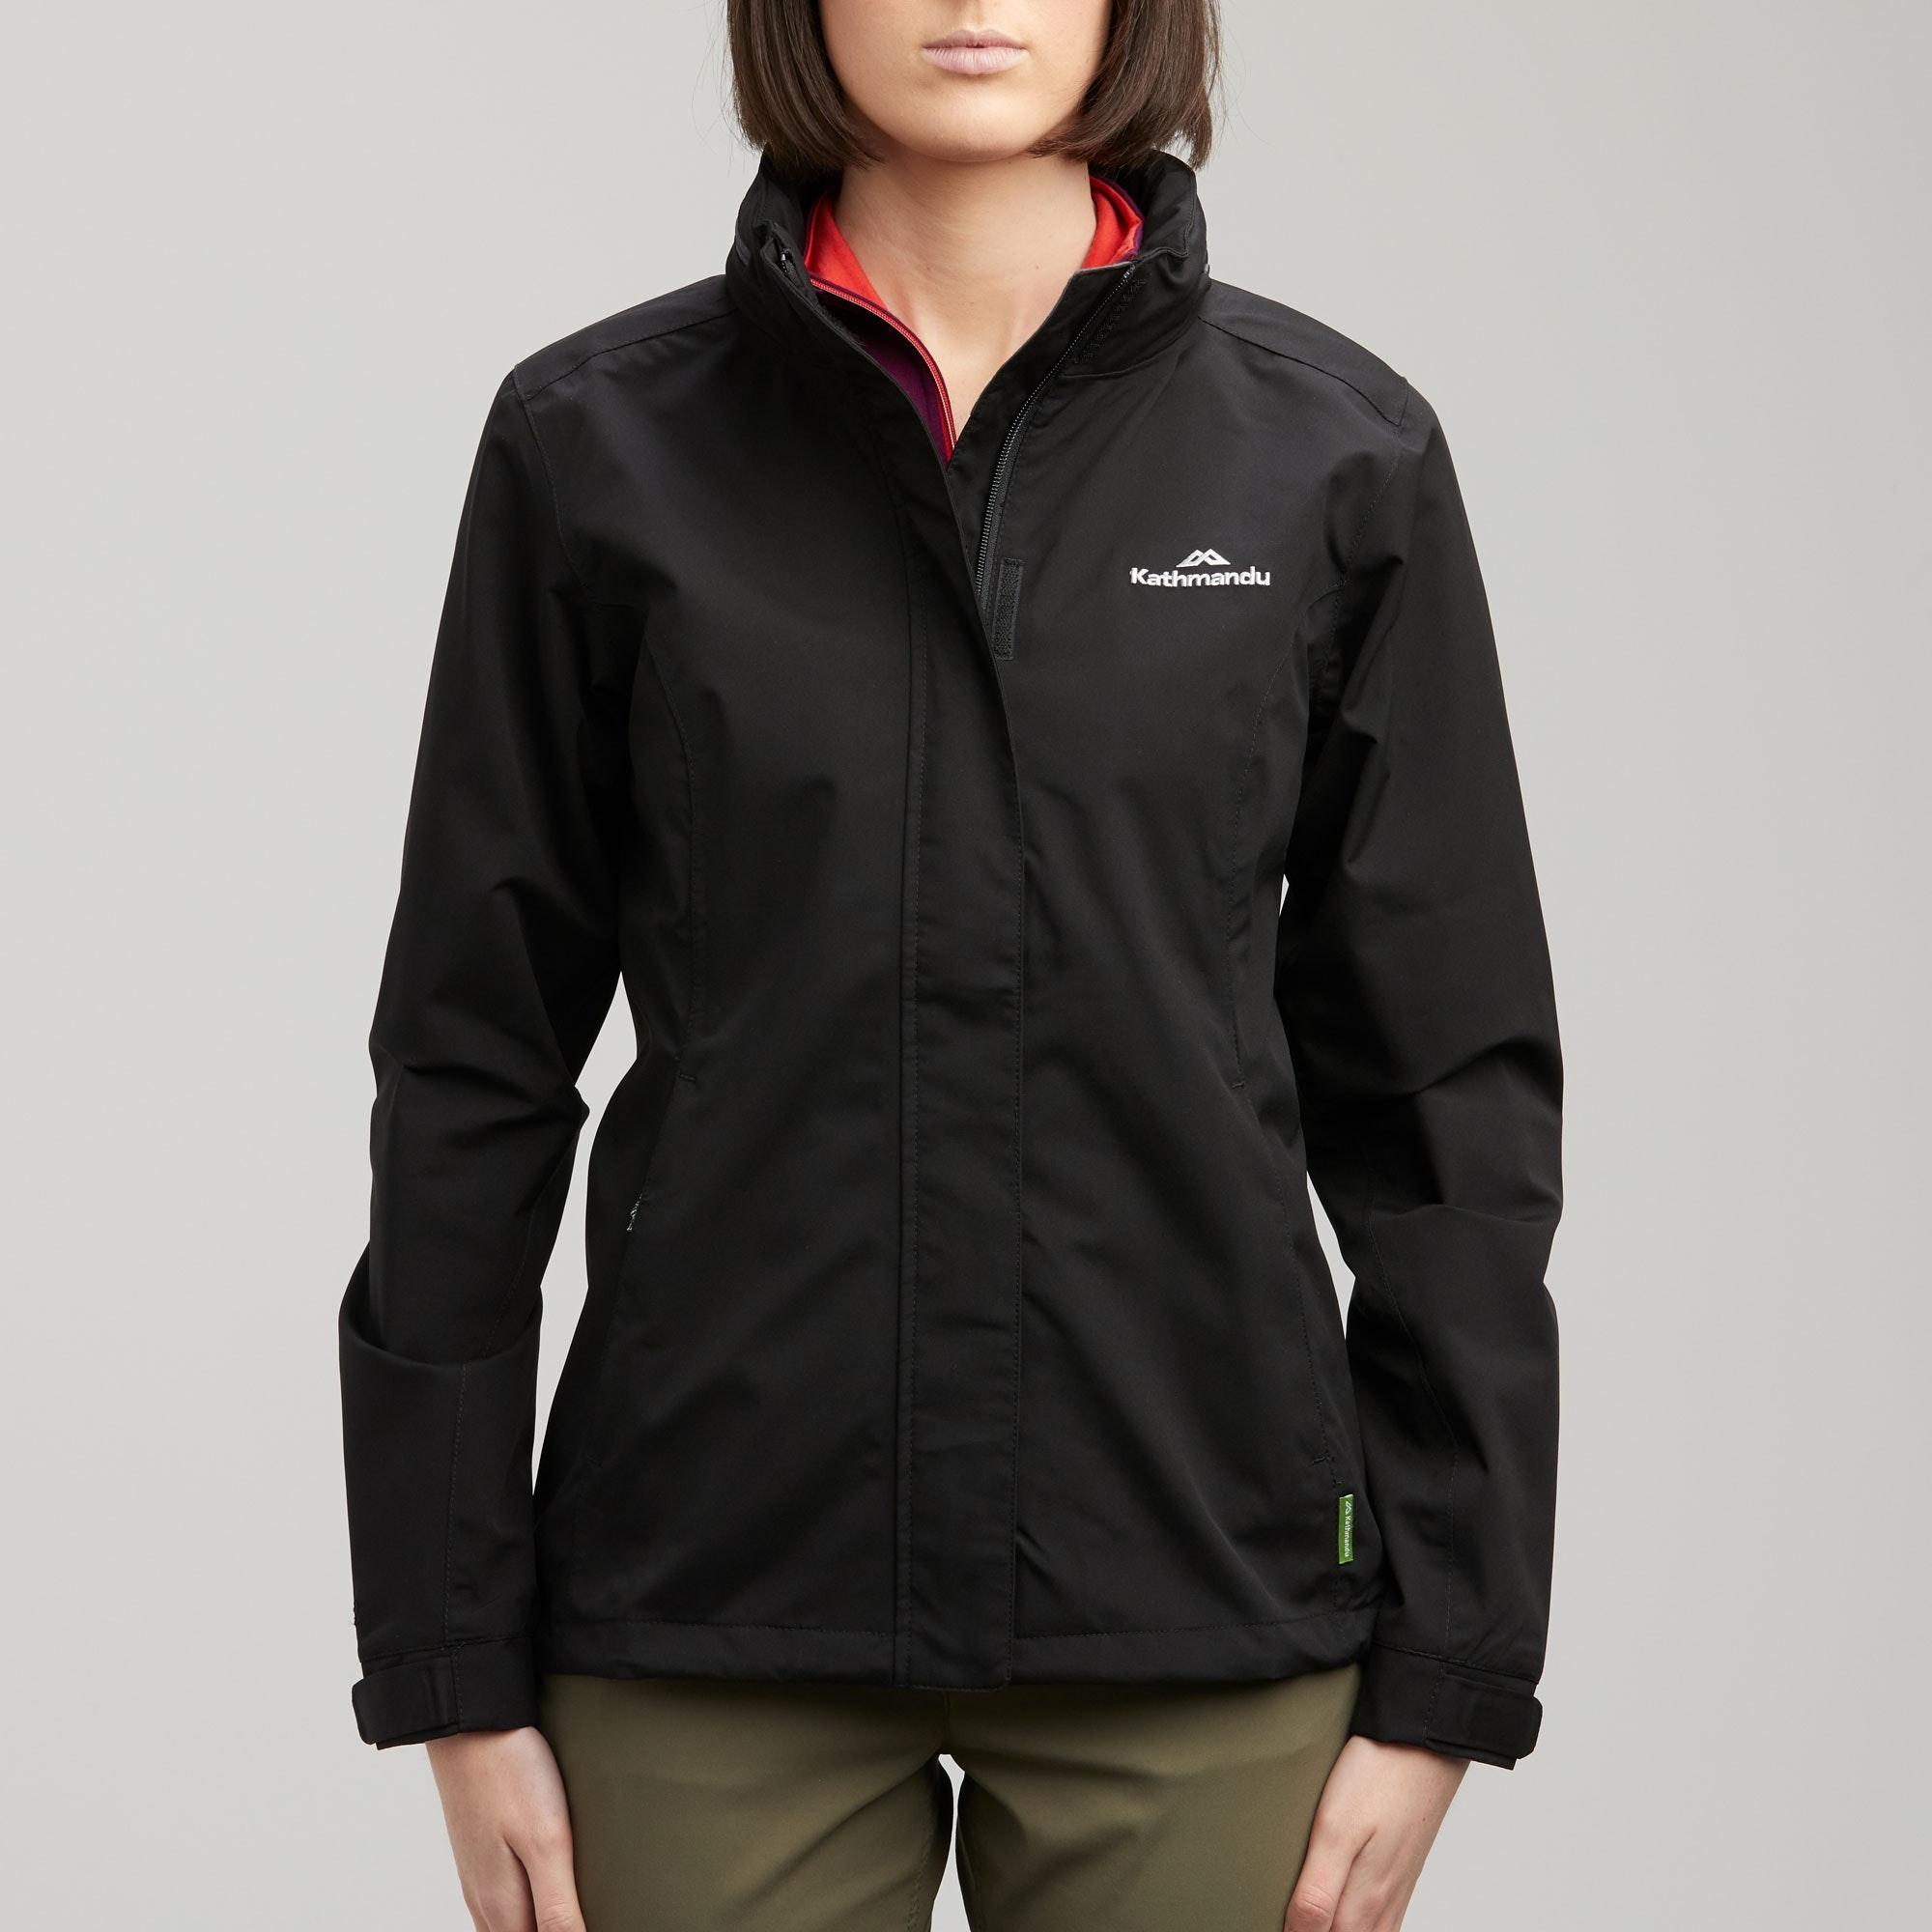 Kathmandu-Andulo-Womens-2-Layer-Windproof-Waterproof-Outdoor-Hiking-Rain-Jacket thumbnail 9